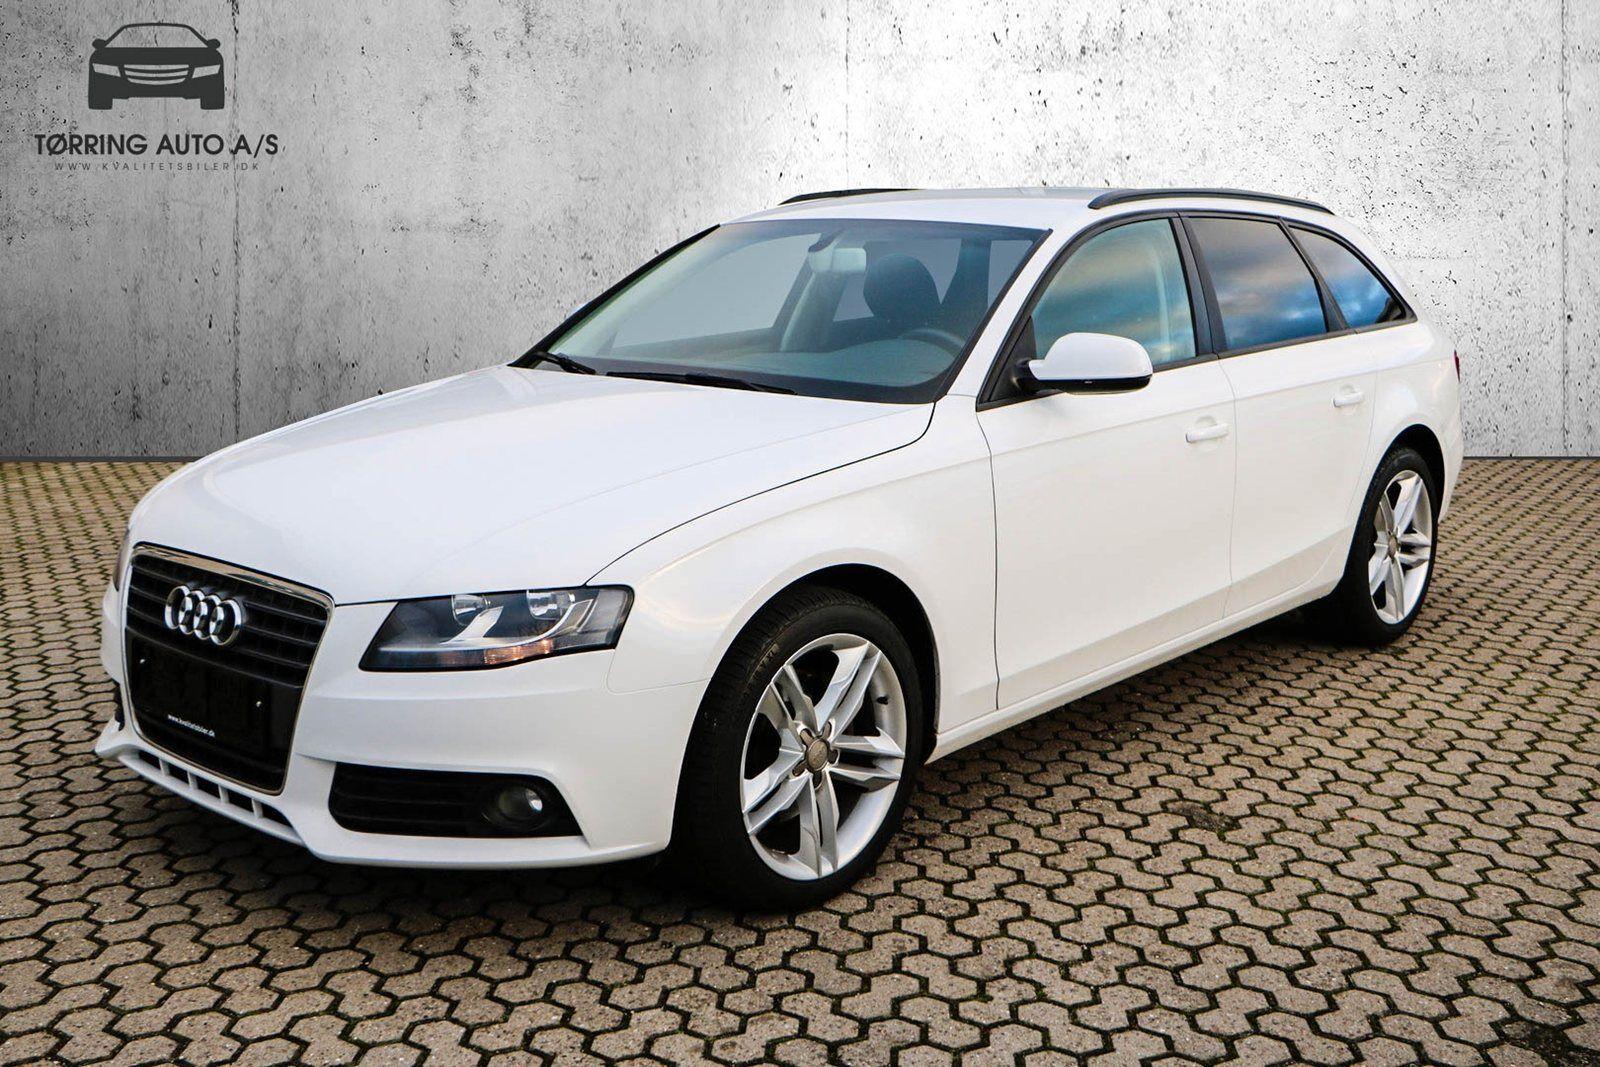 Audi A4 2,0 TFSi 180 Avant Multitr. 5d - 199.900 kr.